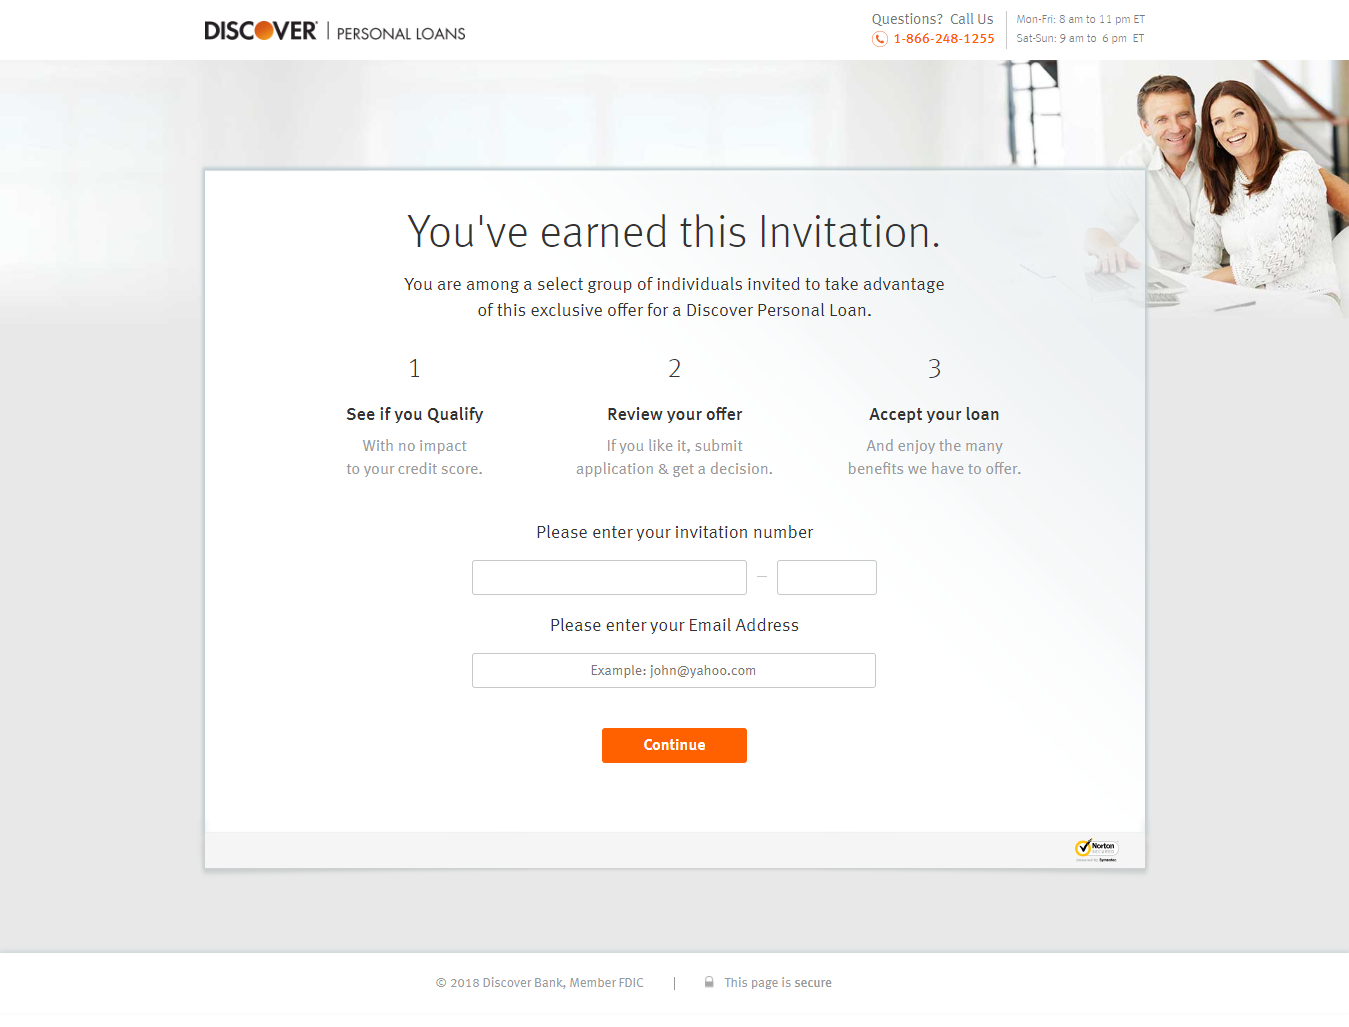 wwwdiscoverpersonalloanscomapply apply for discover personal loan - Discover Card Personal Loan